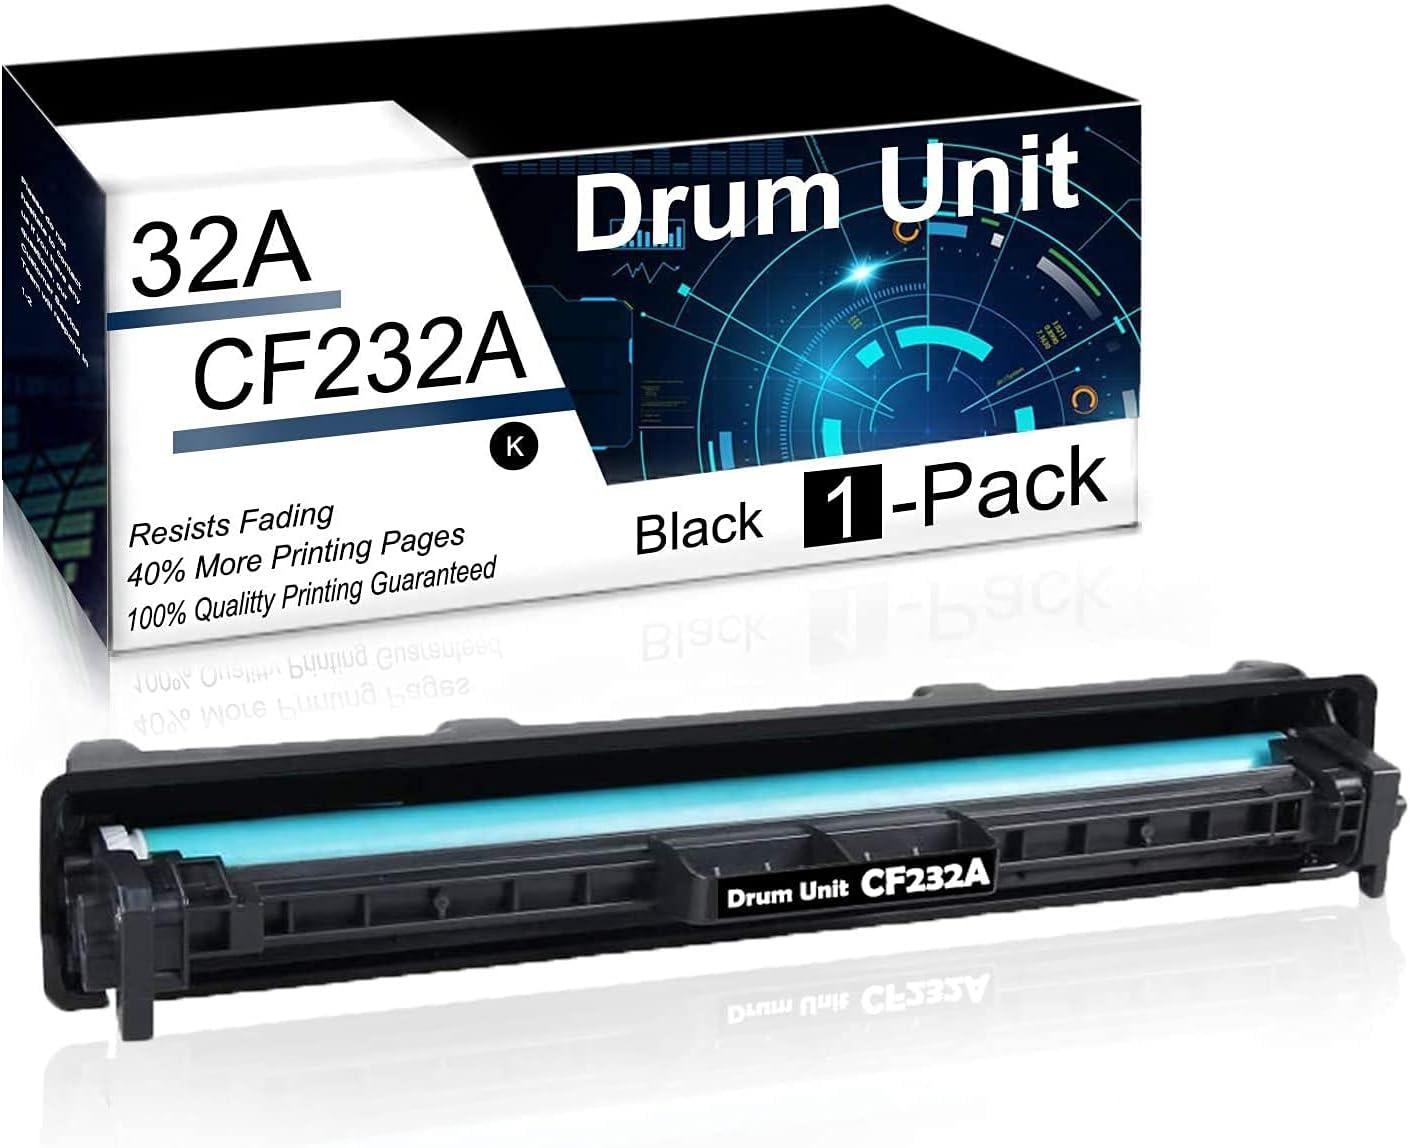 1 Pack Black 32A | CF232A Compatible Drum Unit for HP Laserjet Pro M203dn M203dw M203d MFP M227sdn MFP M227fdw MFP M227fdn Ultra MFP M230sdn MFP M230fdw Printer Drum Unit.